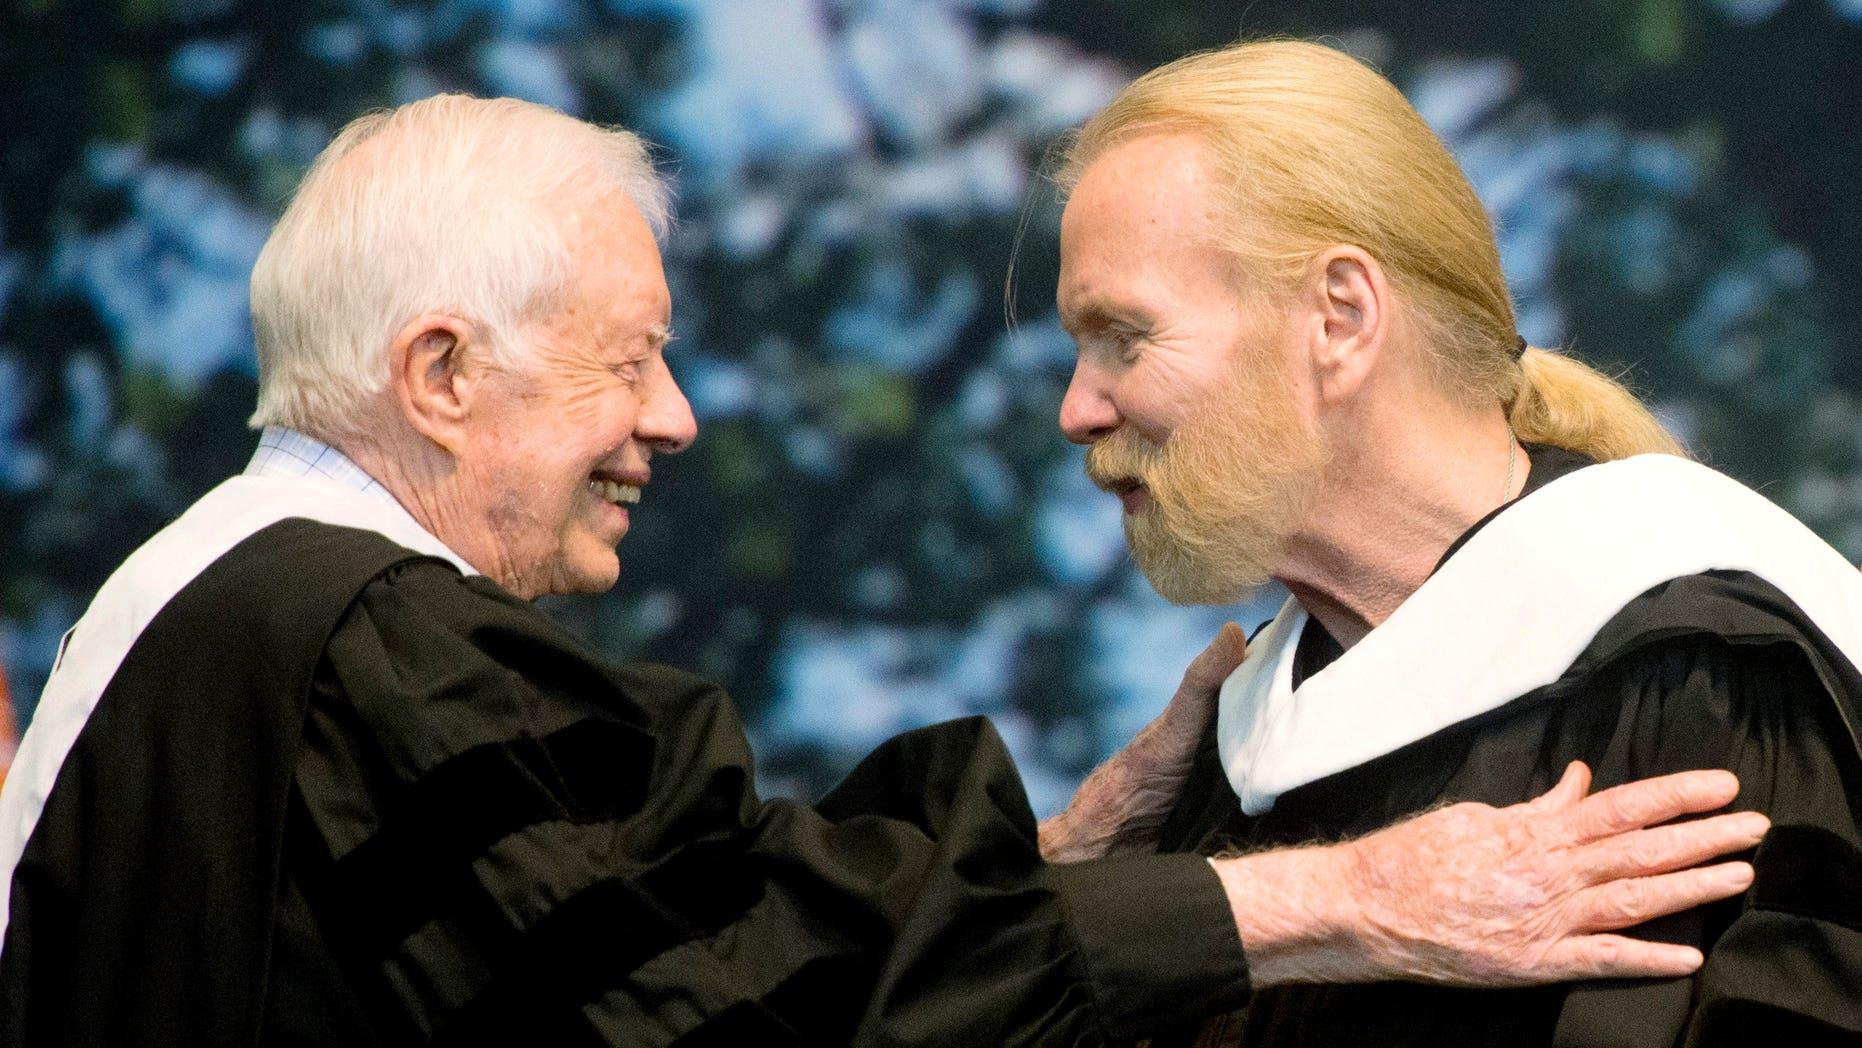 Jimmy Carter hugs Gregg Allman who received an honorary degree at Mercer University in Macon, Ga.